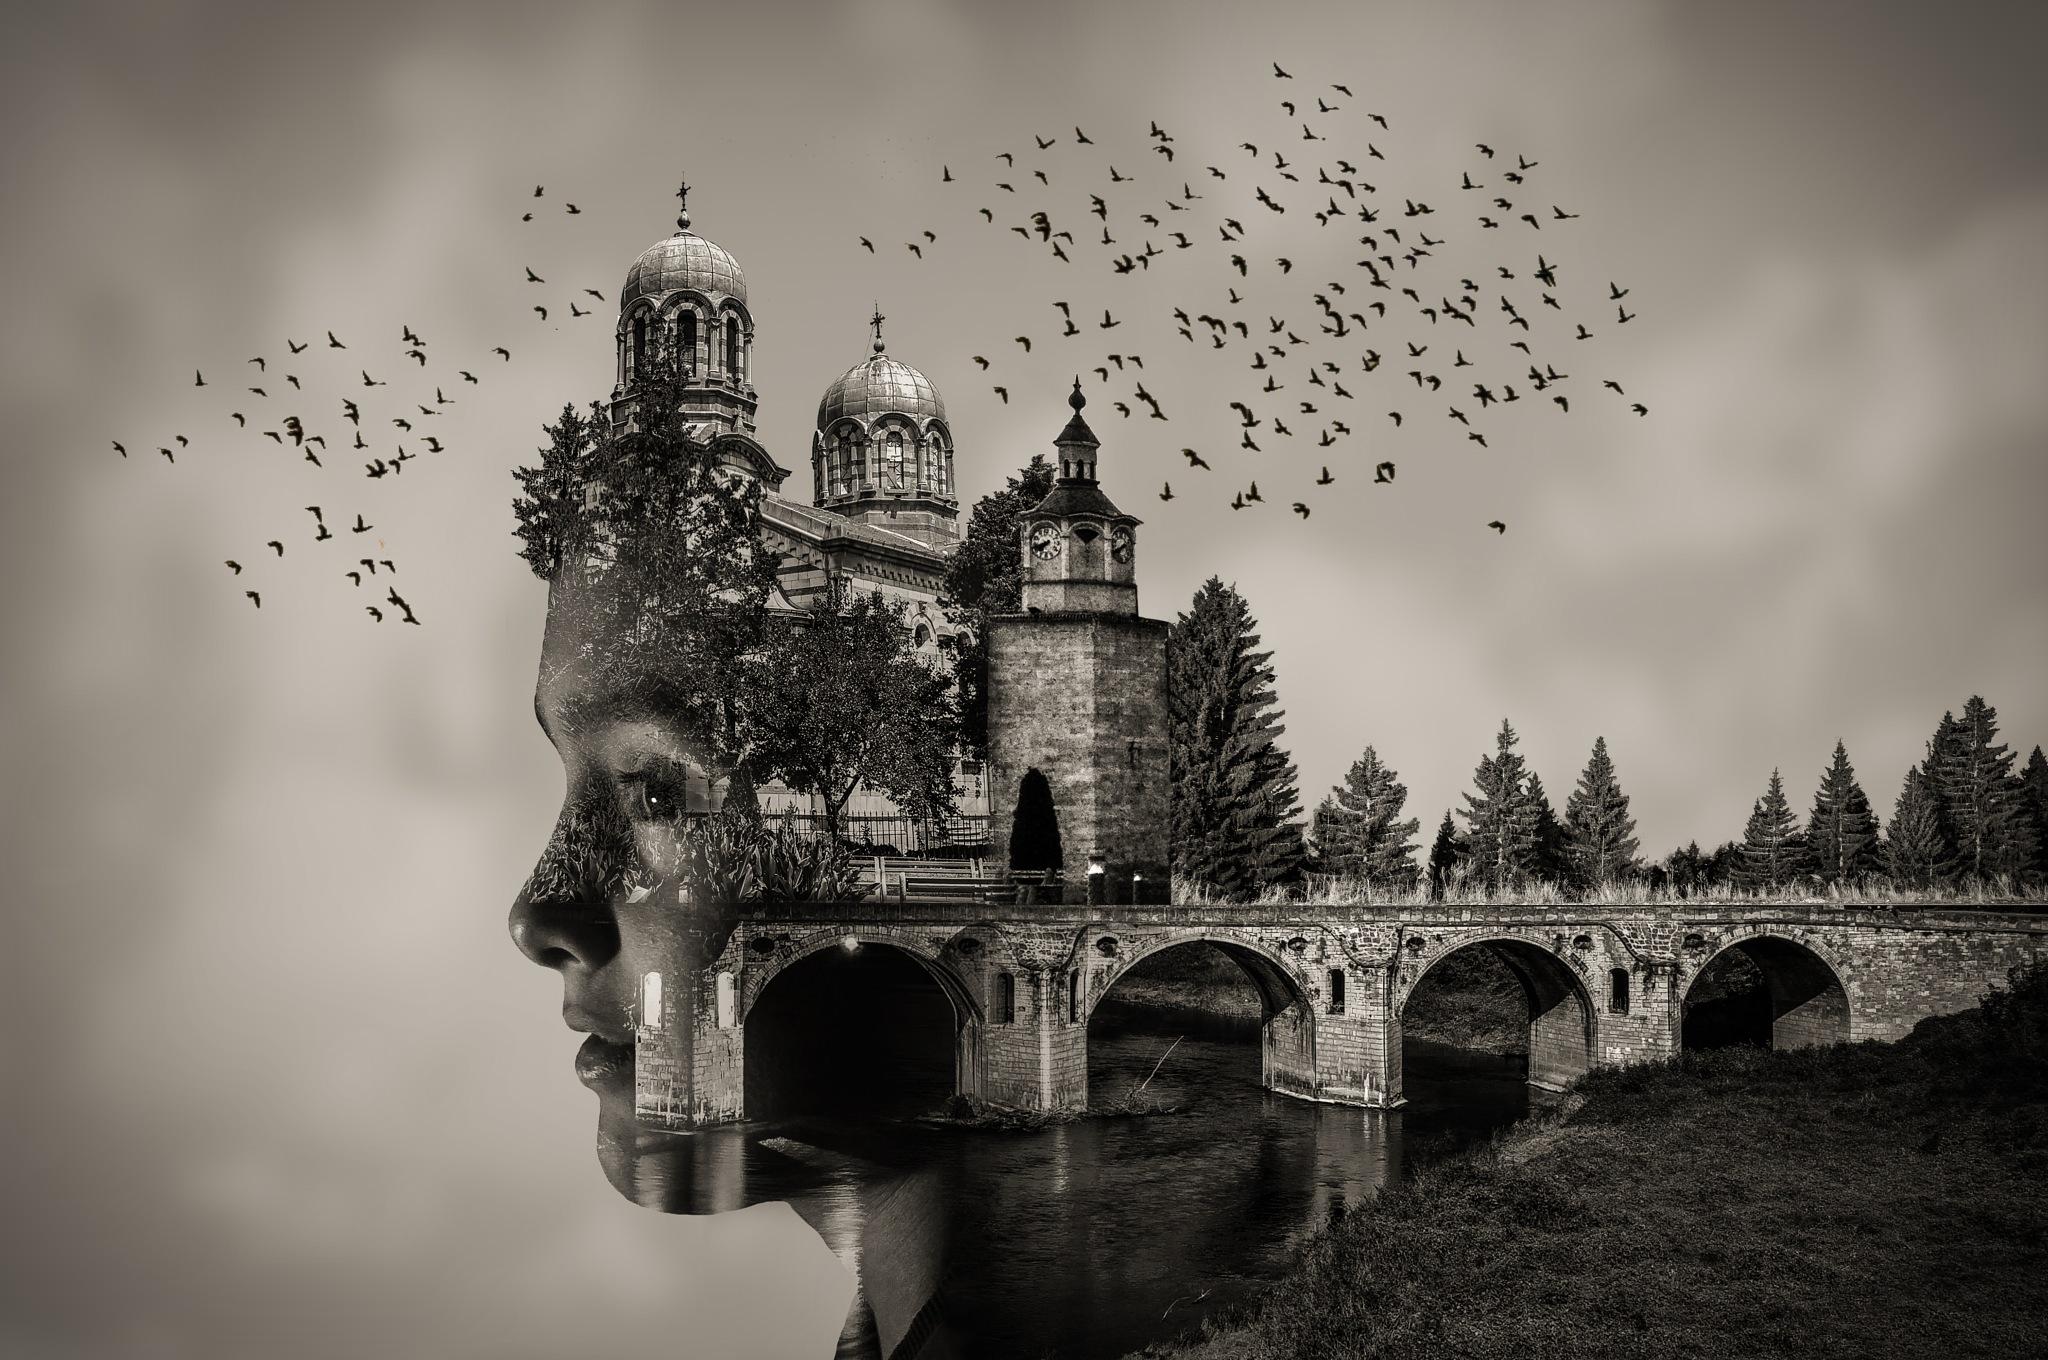 Art by Tsvetan Ganev-CECLII